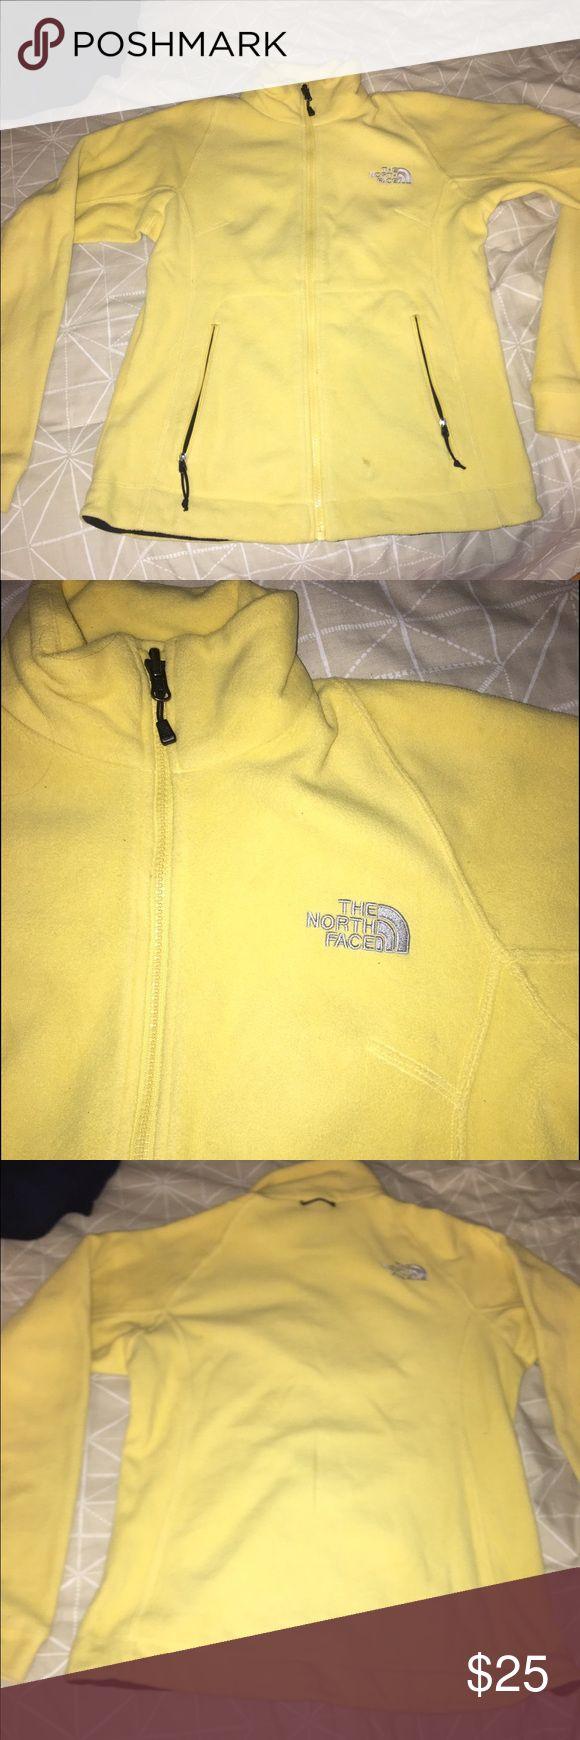 Women's Yellow North Face Fleece zip up Great condition! North Face Tops Sweatshirts & Hoodies